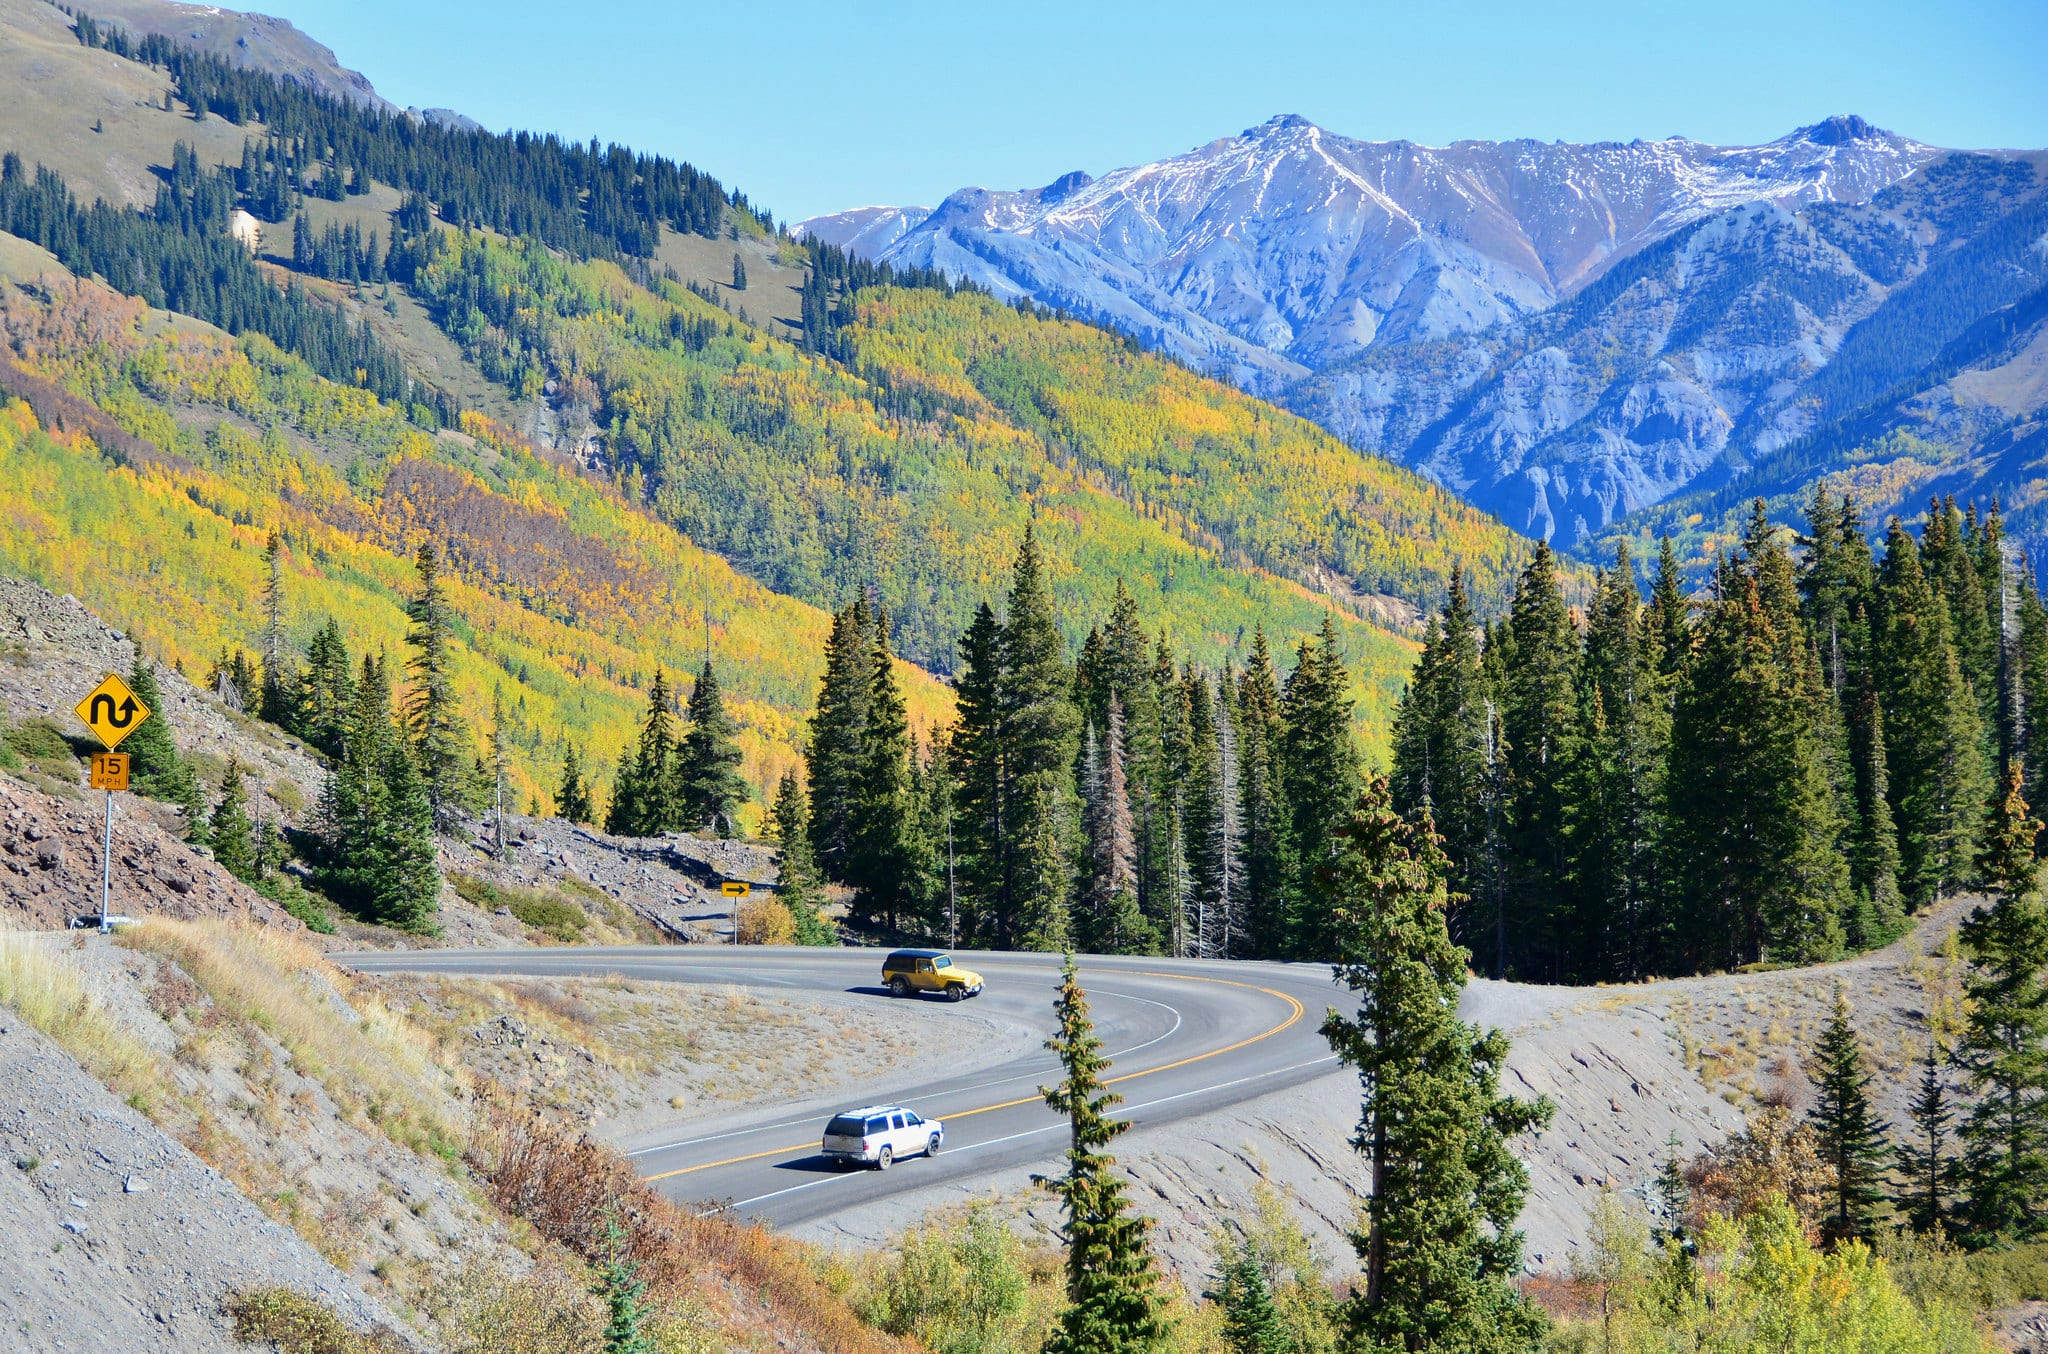 image of million dollar highway